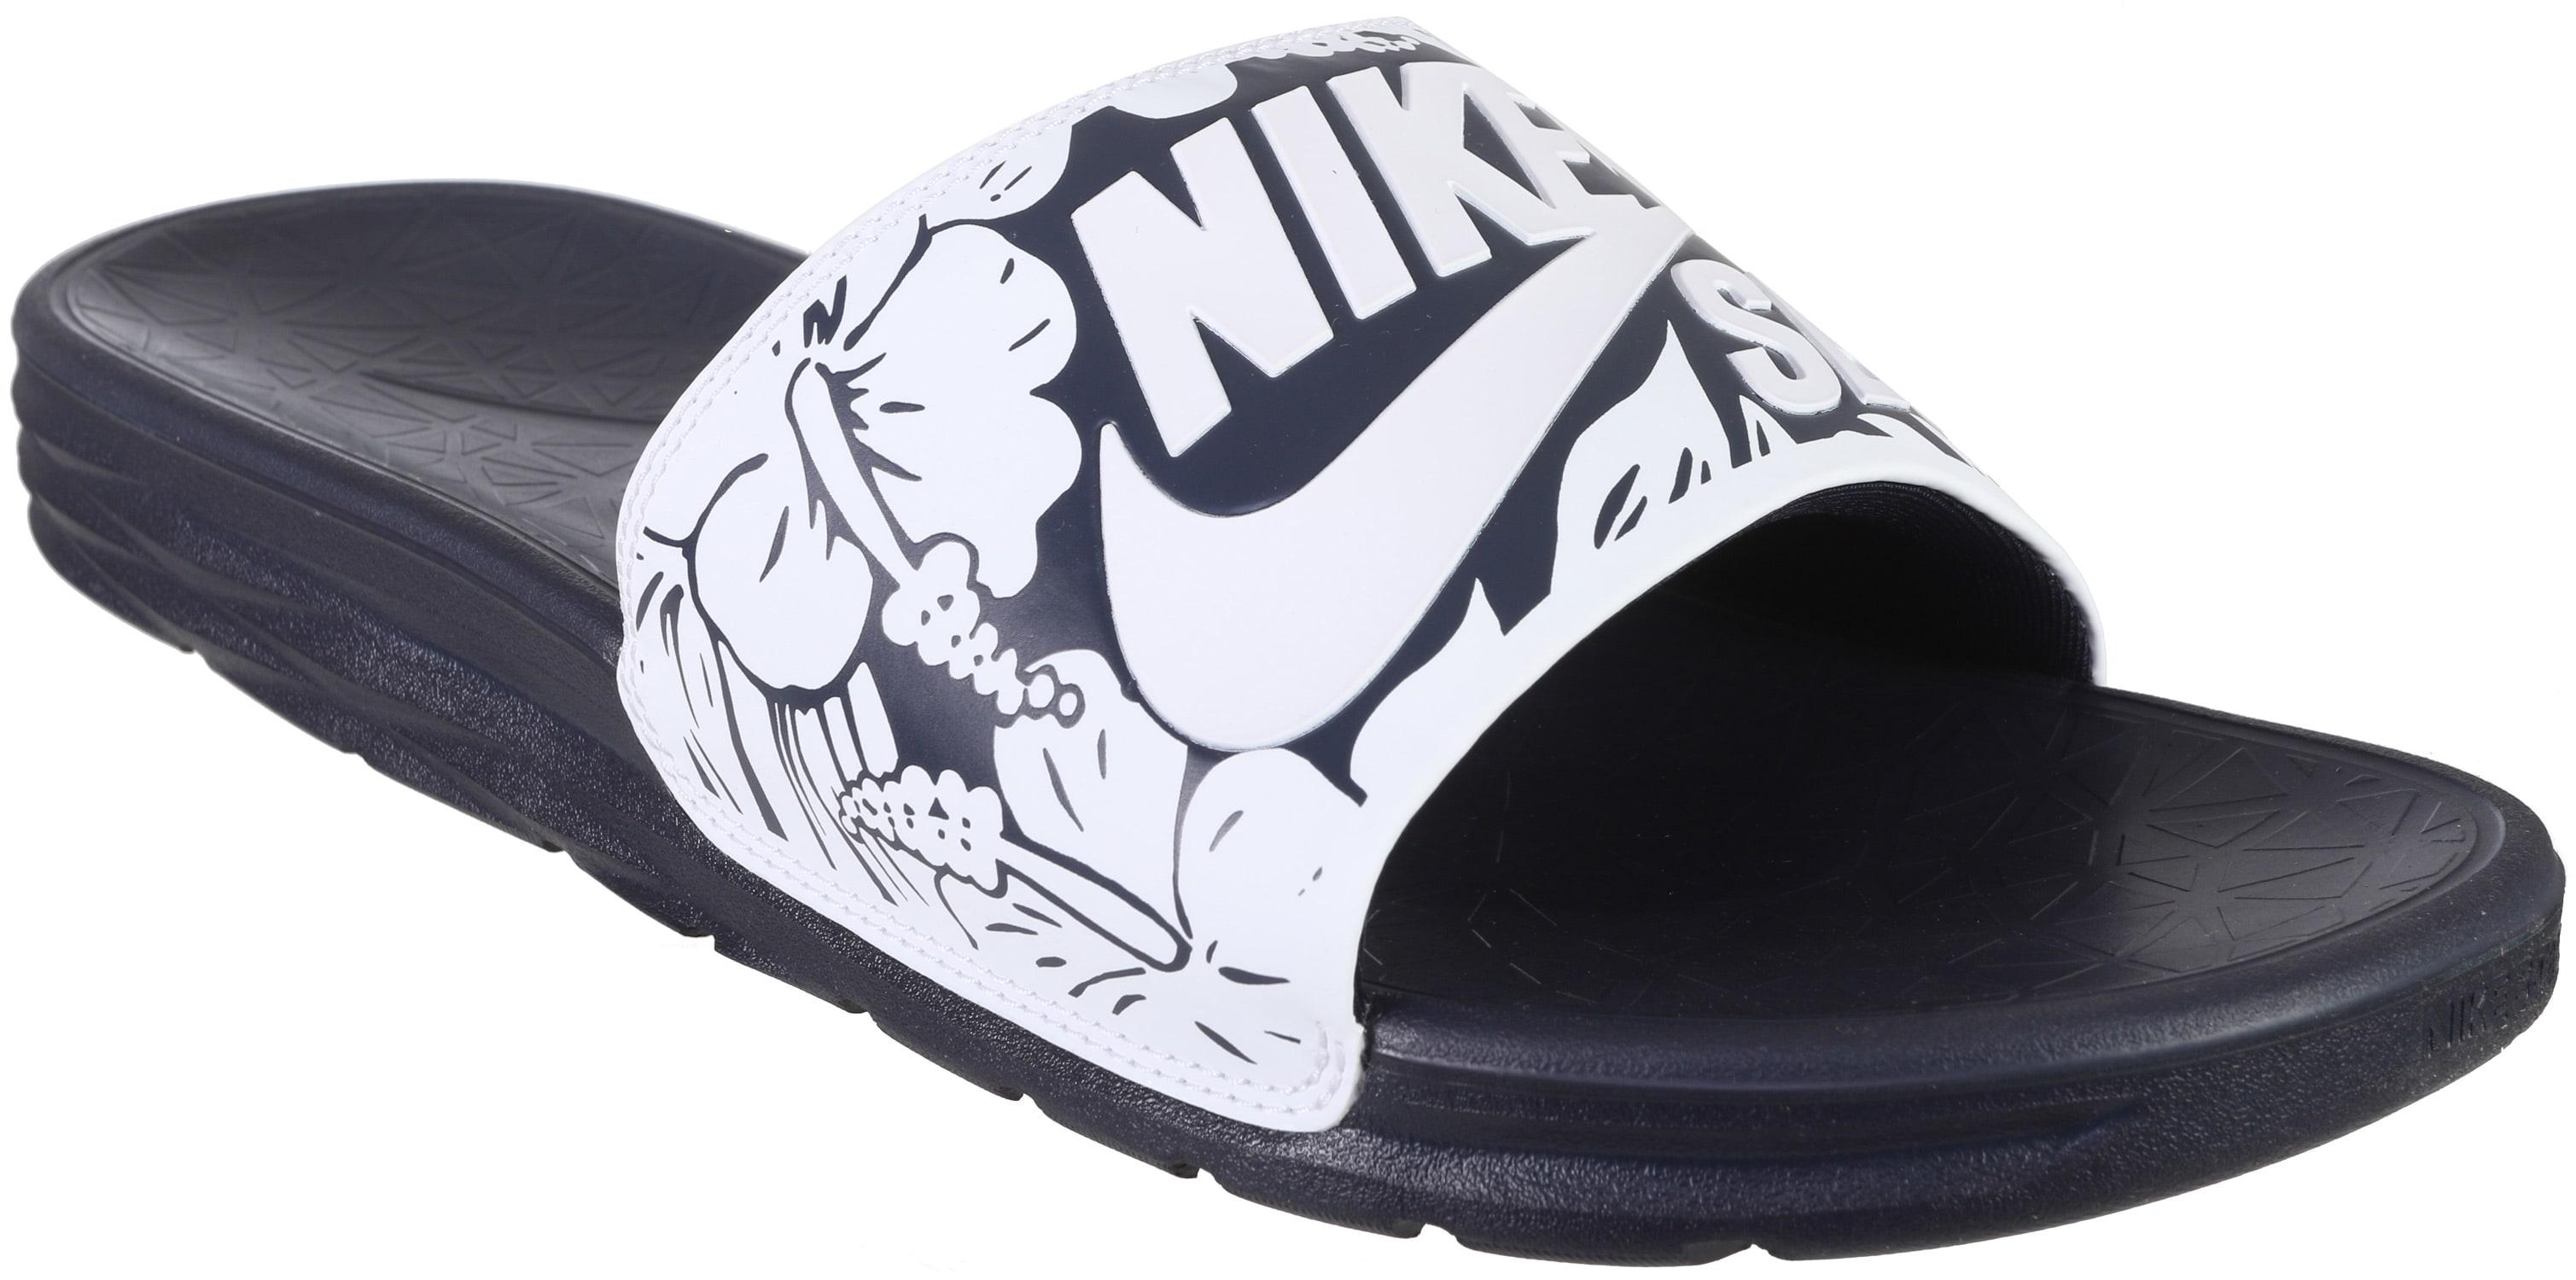 Nike Benassi Solarsoft SB Print Sandals - thumbnail 2 7301bc147504